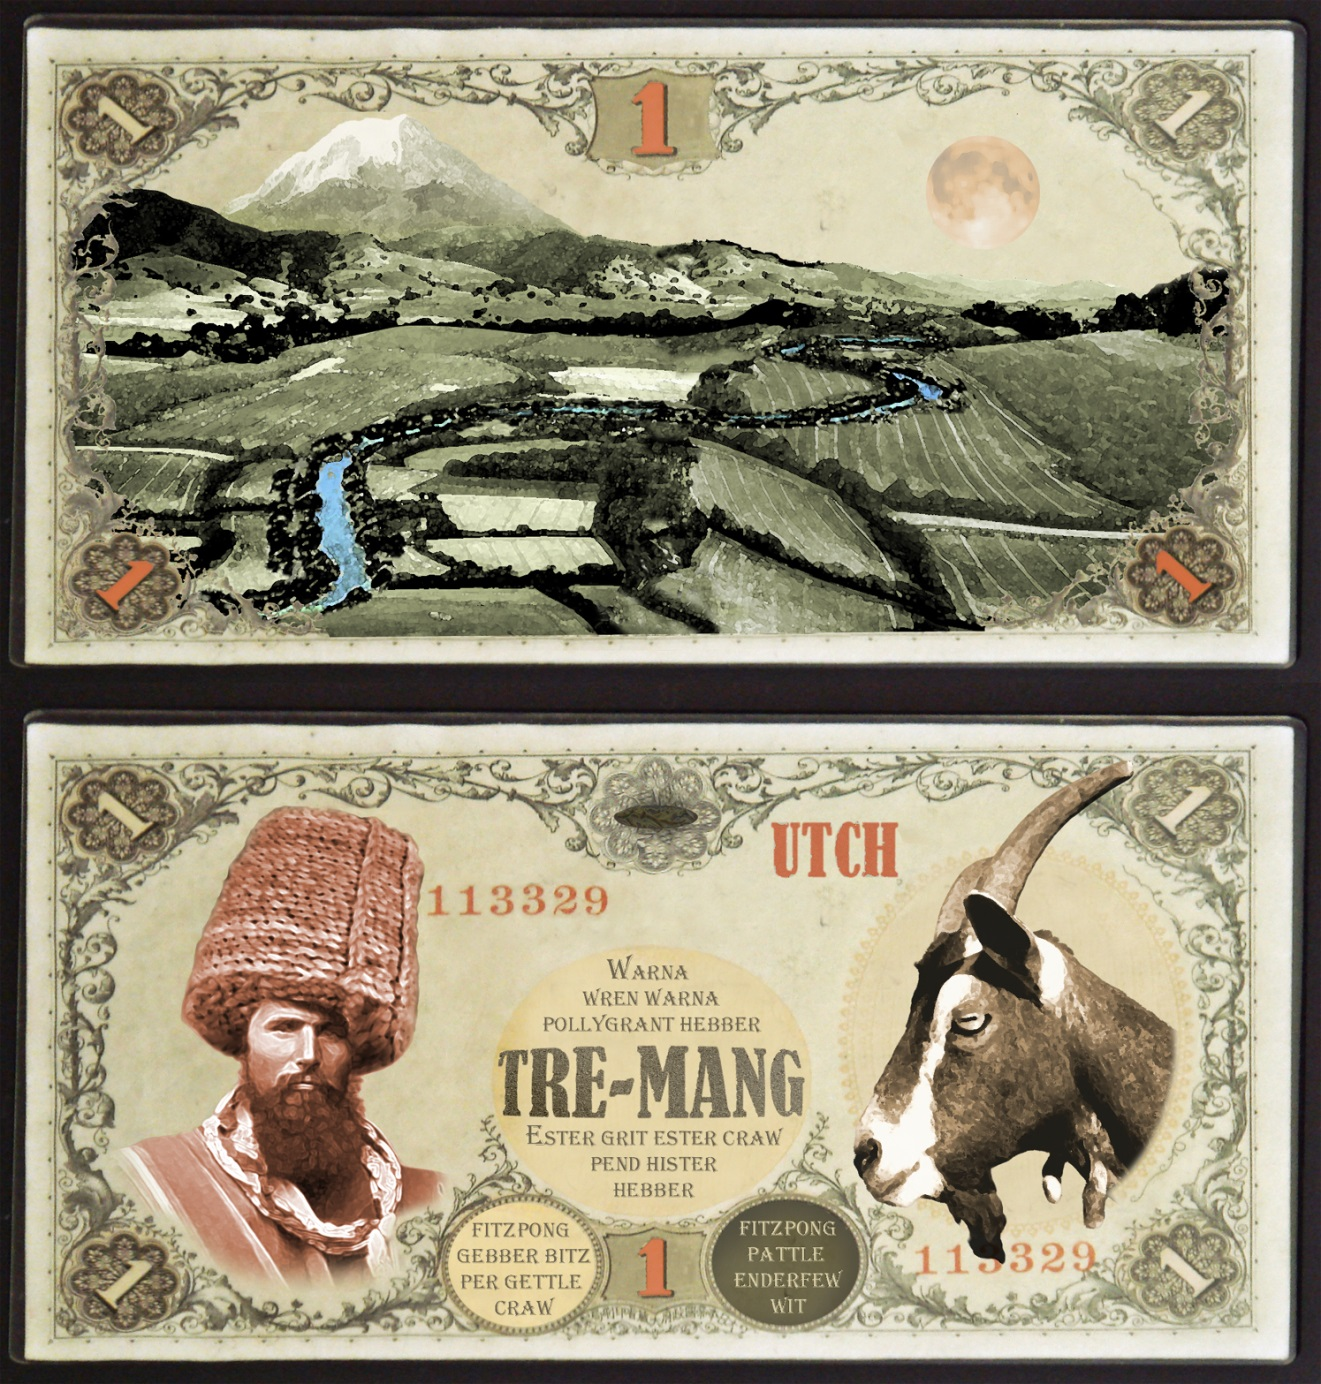 Tre-manner Currency.jpg